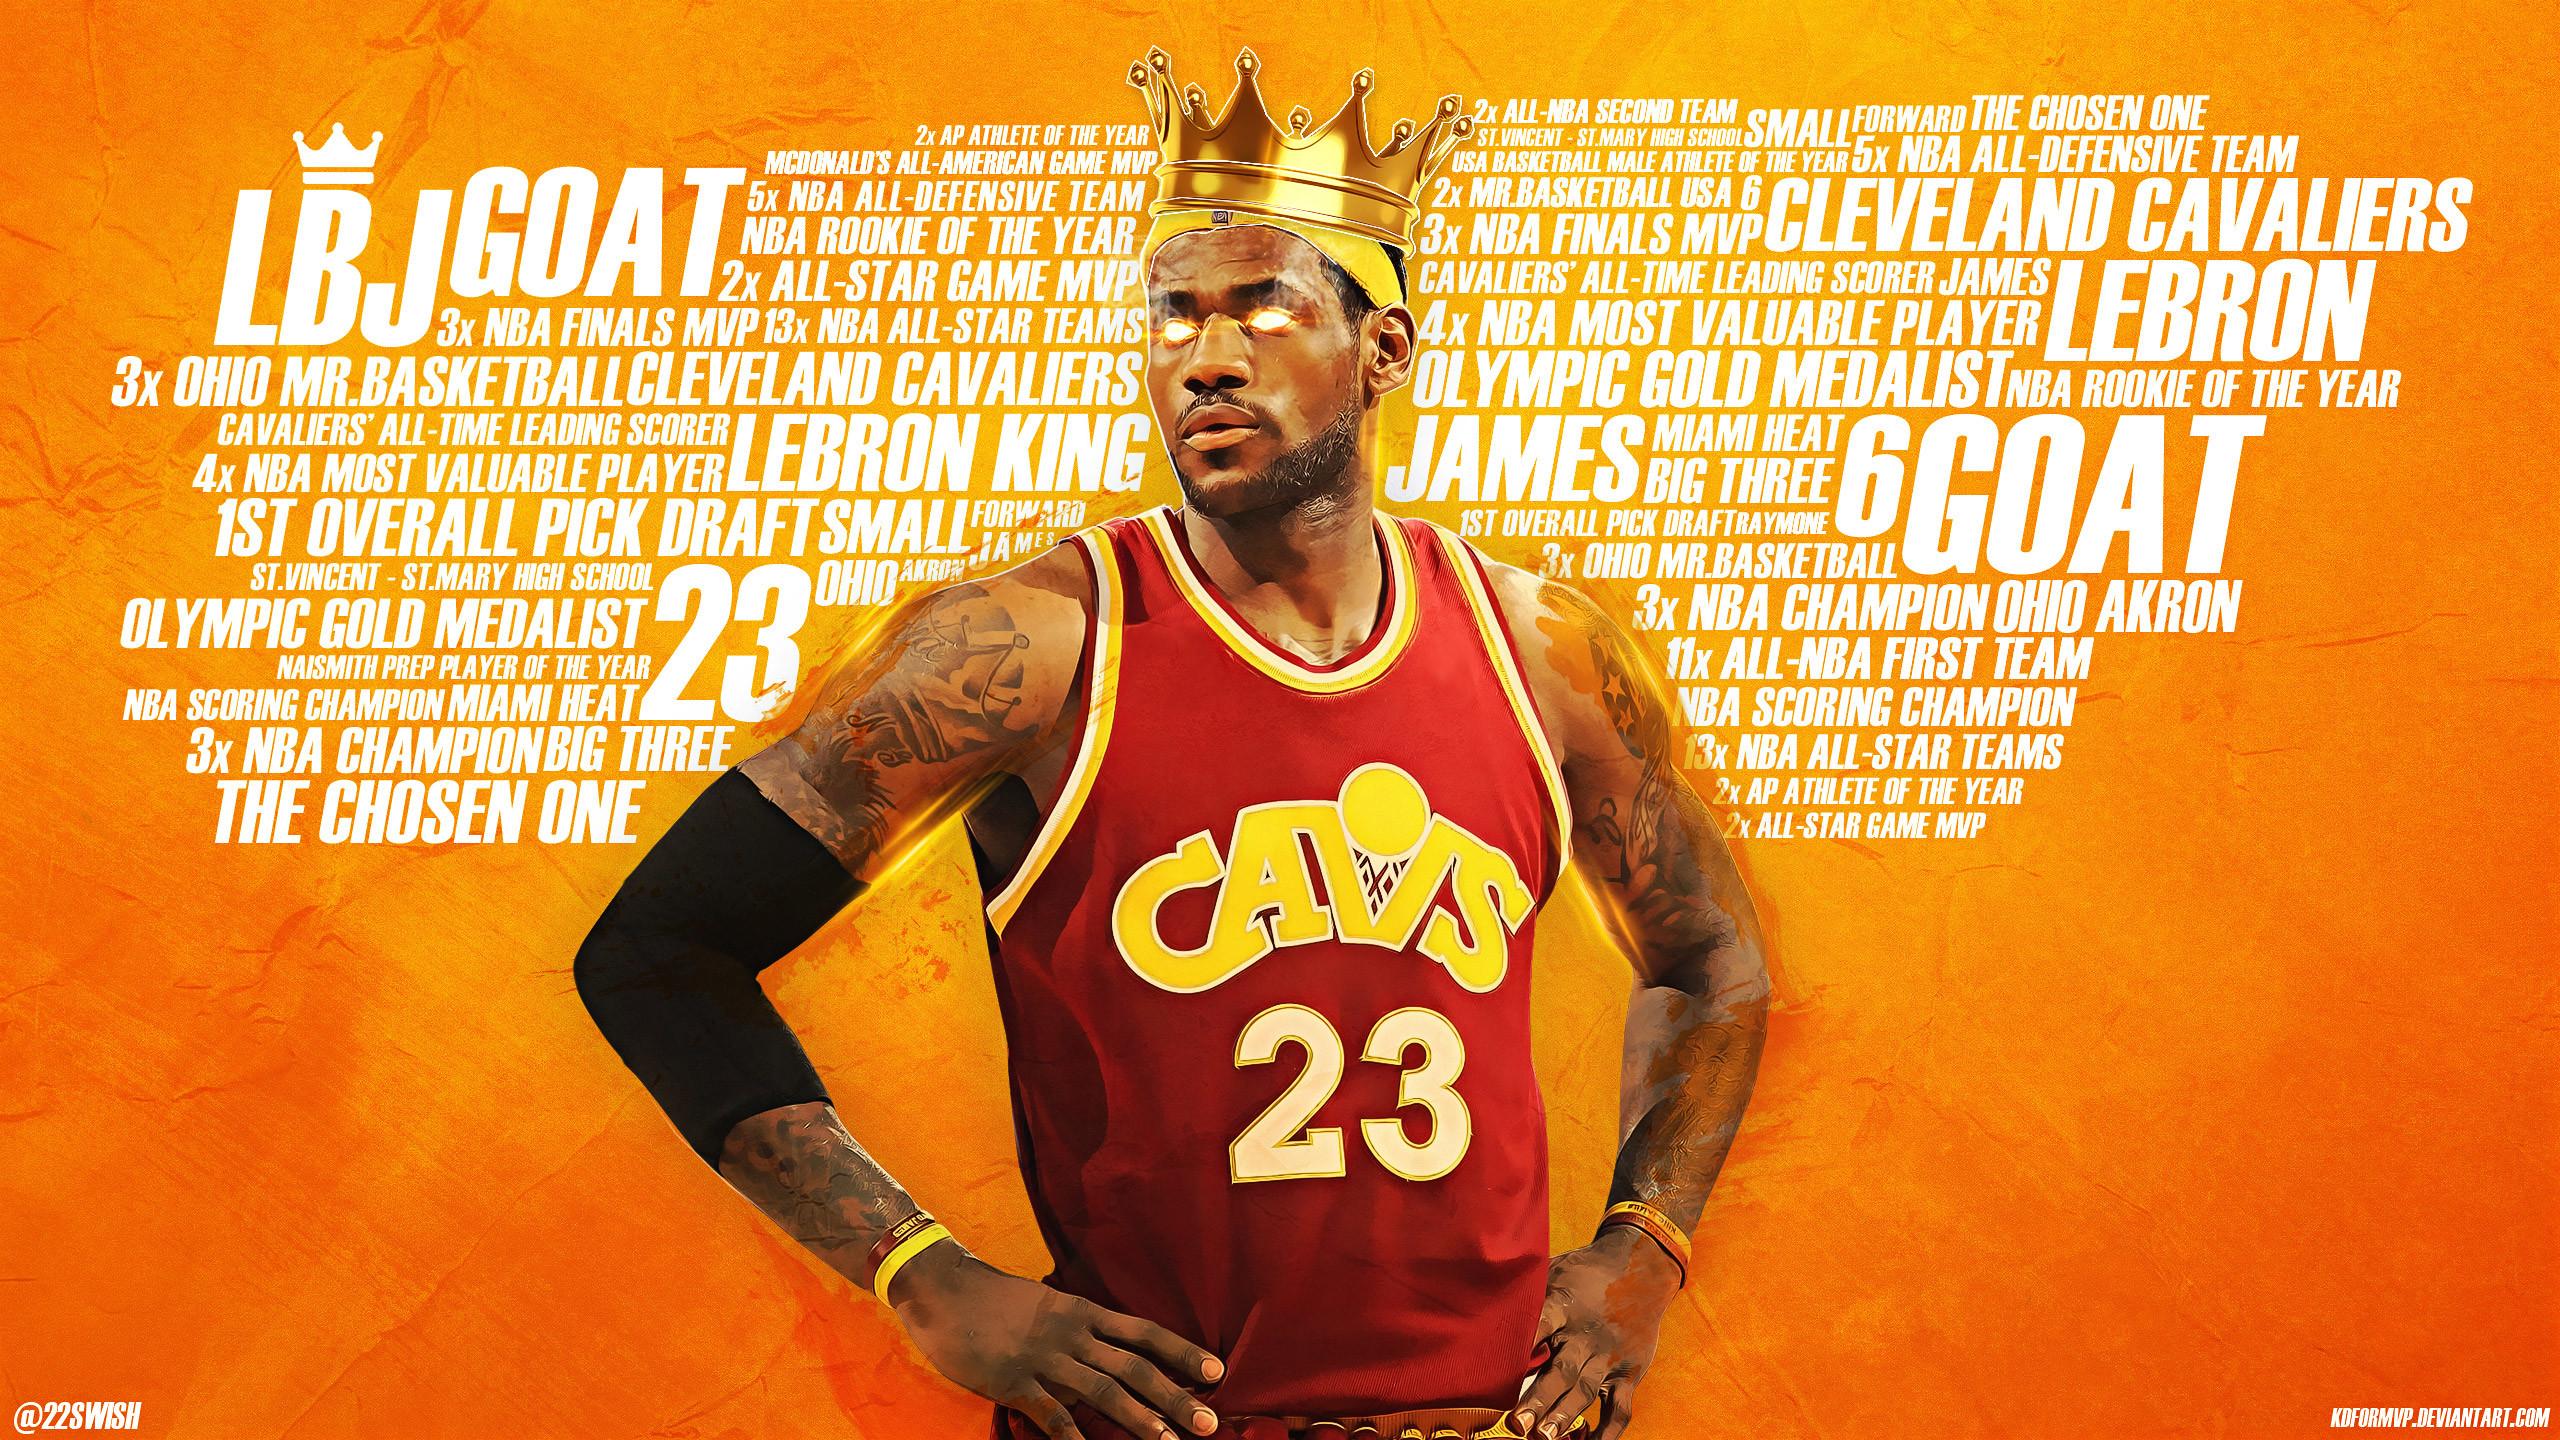 Nike Basketball Wallpaper 2018 50 Images